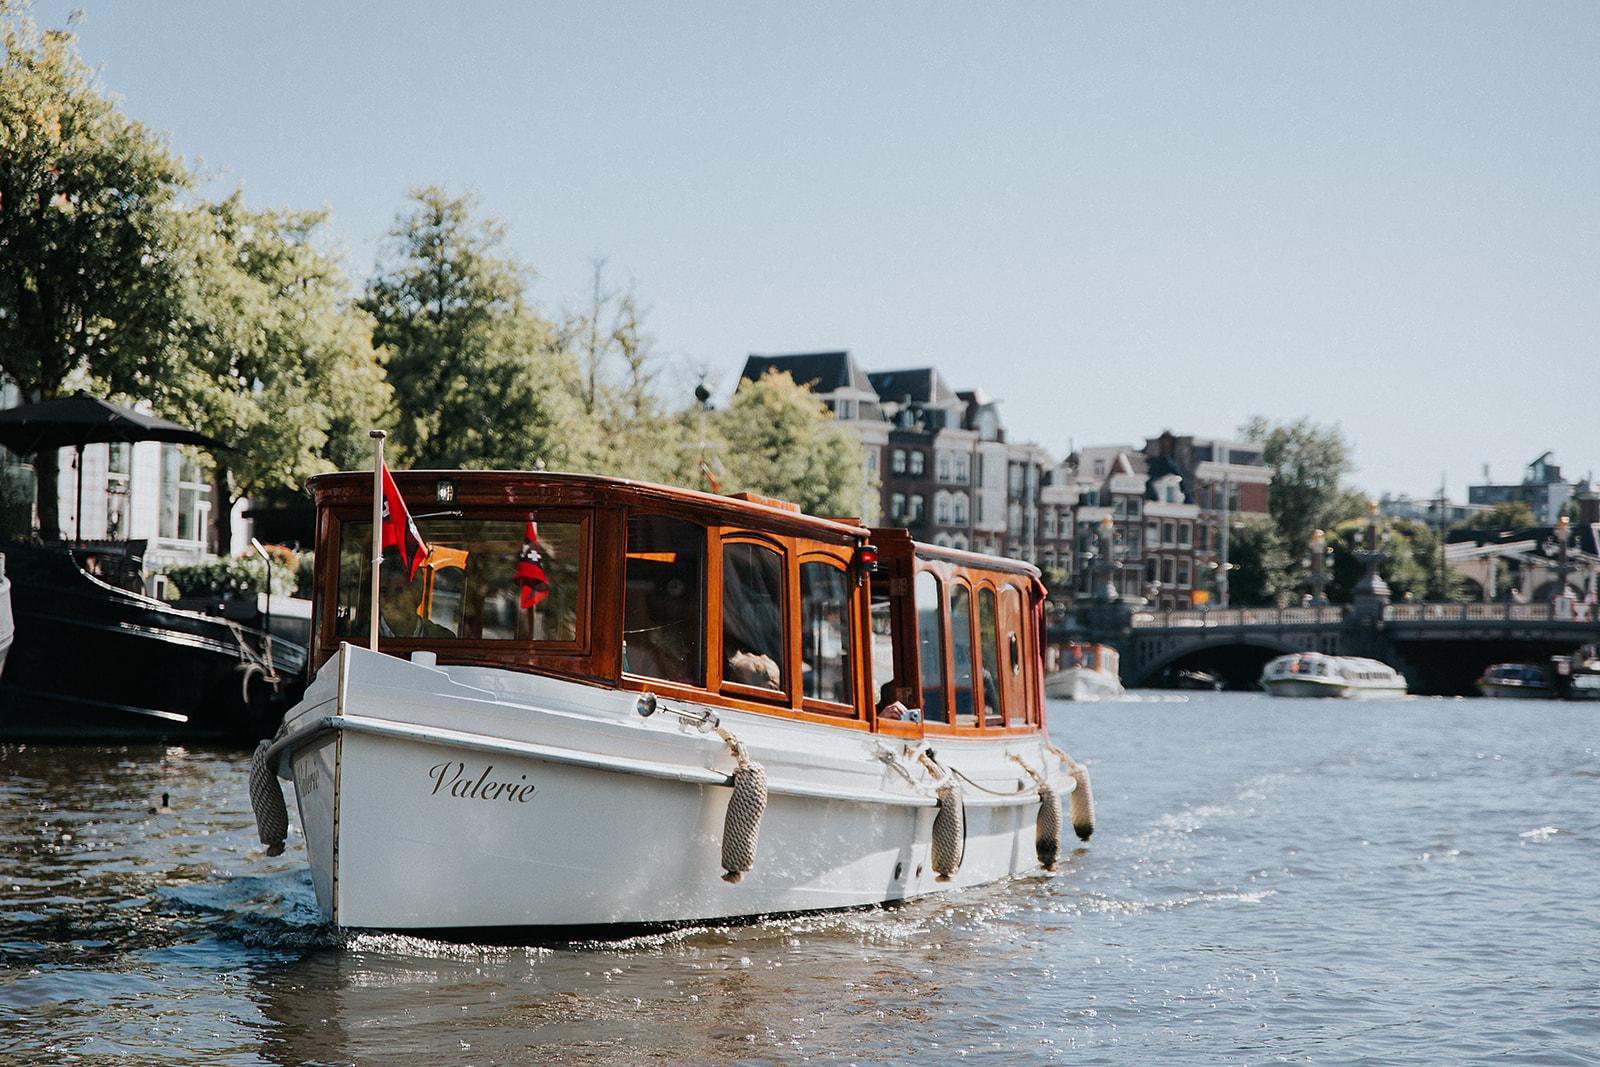 180913_AmsterdamBoothuur-10_websize.jpg